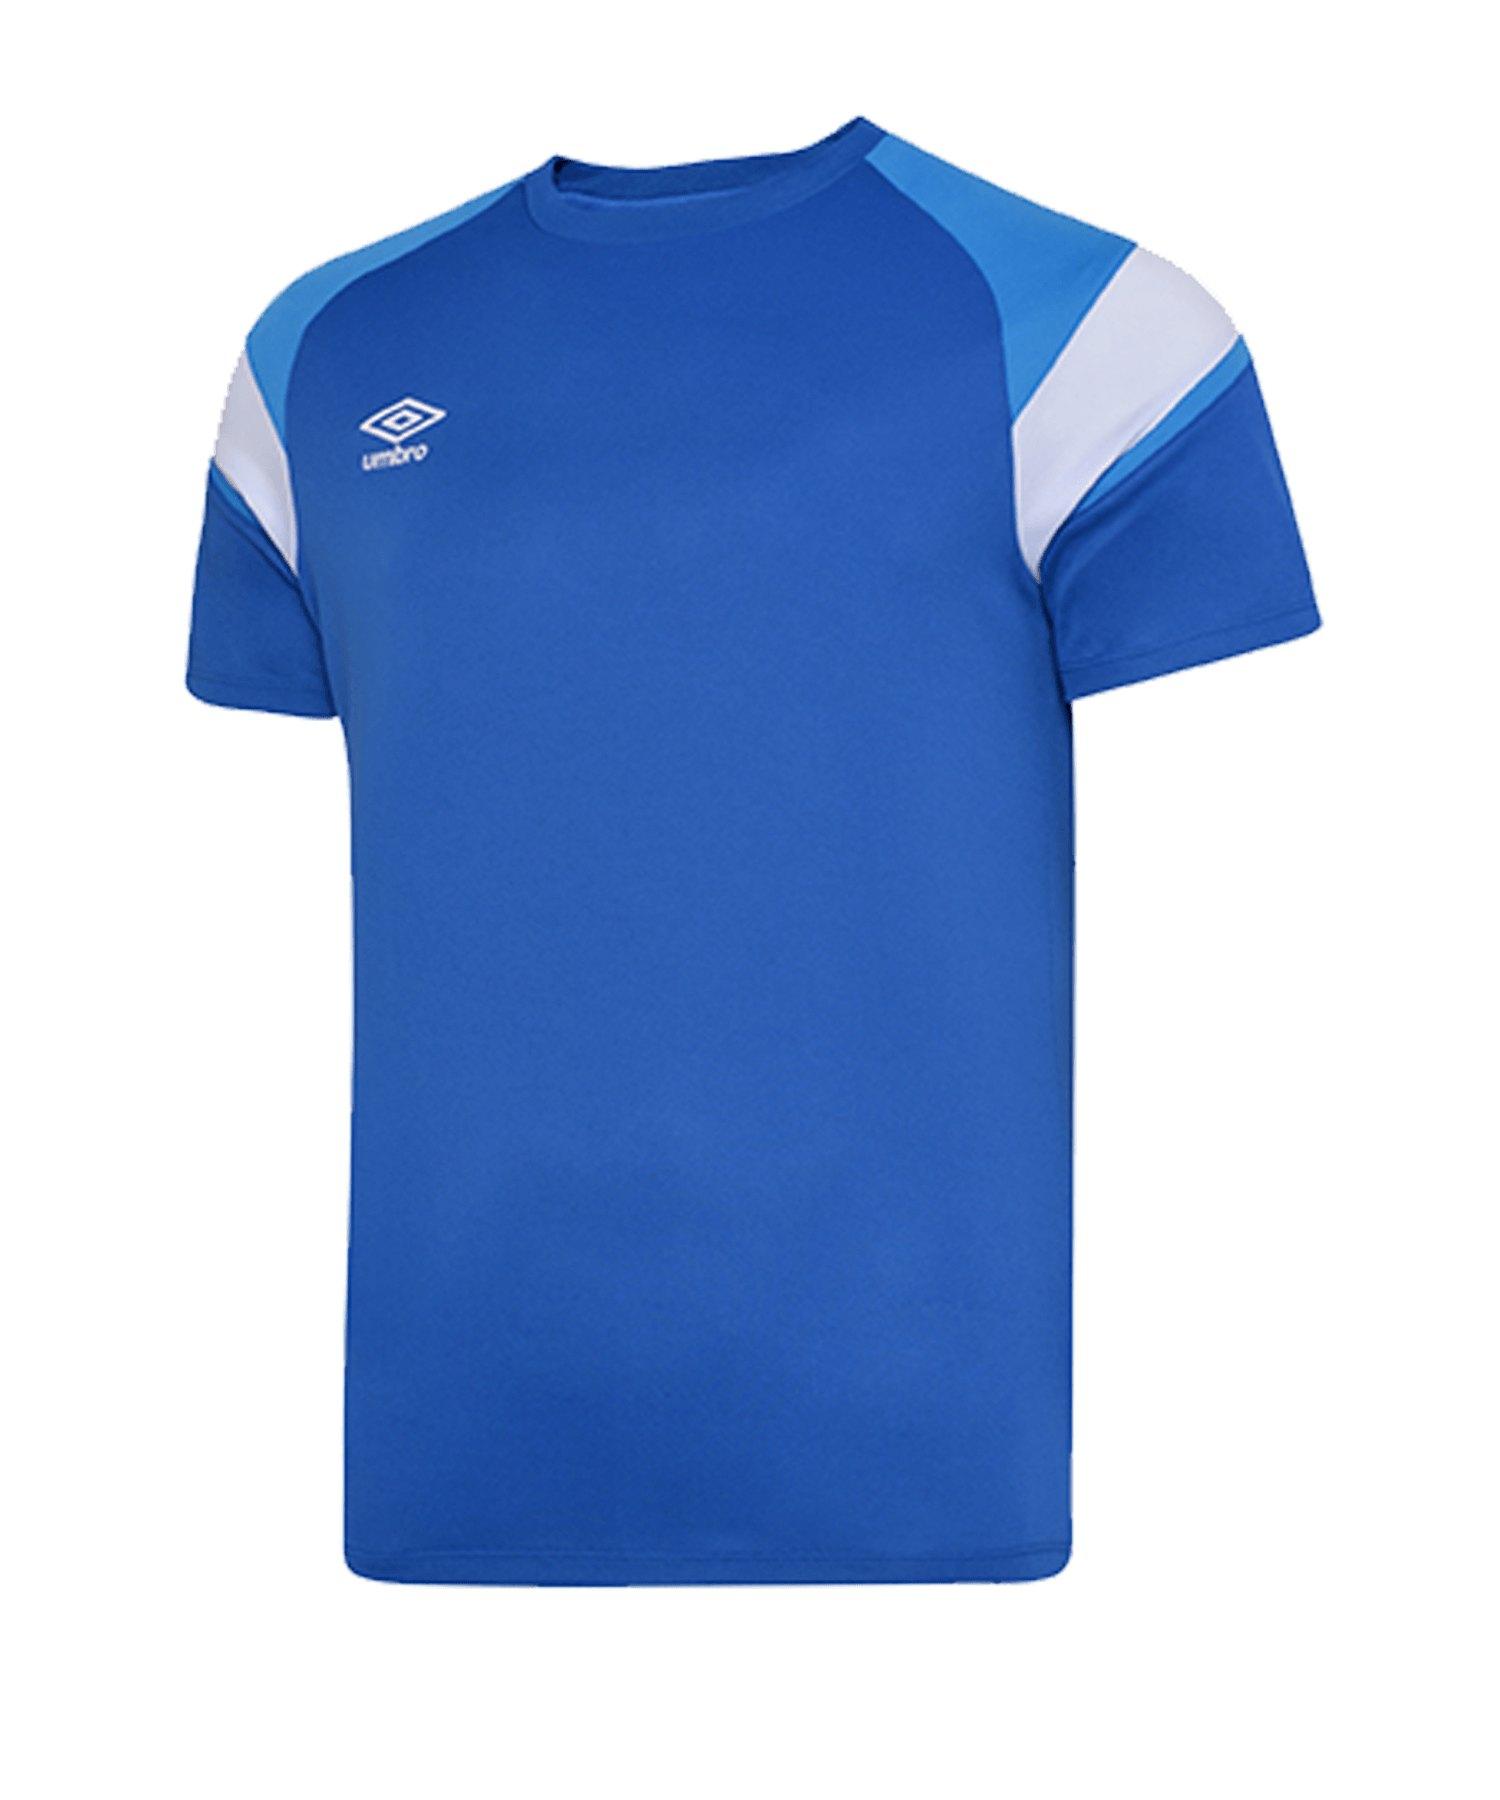 Umbro Training Jersey Trikot Kids Blau FGQW - blau